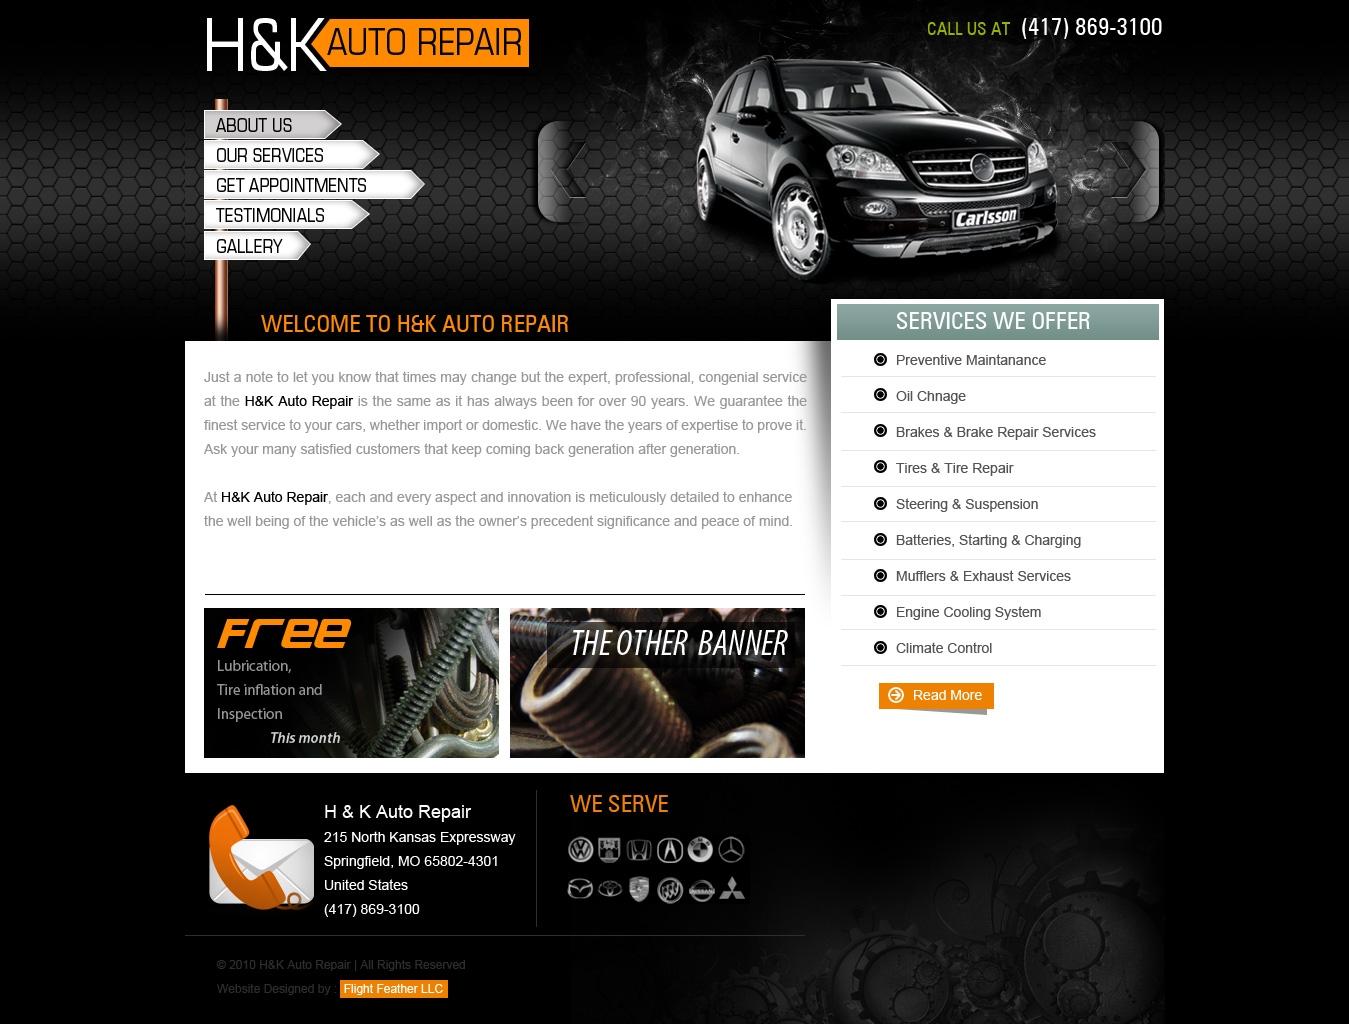 HK Auto Repair Web Design by View9 on DeviantArt